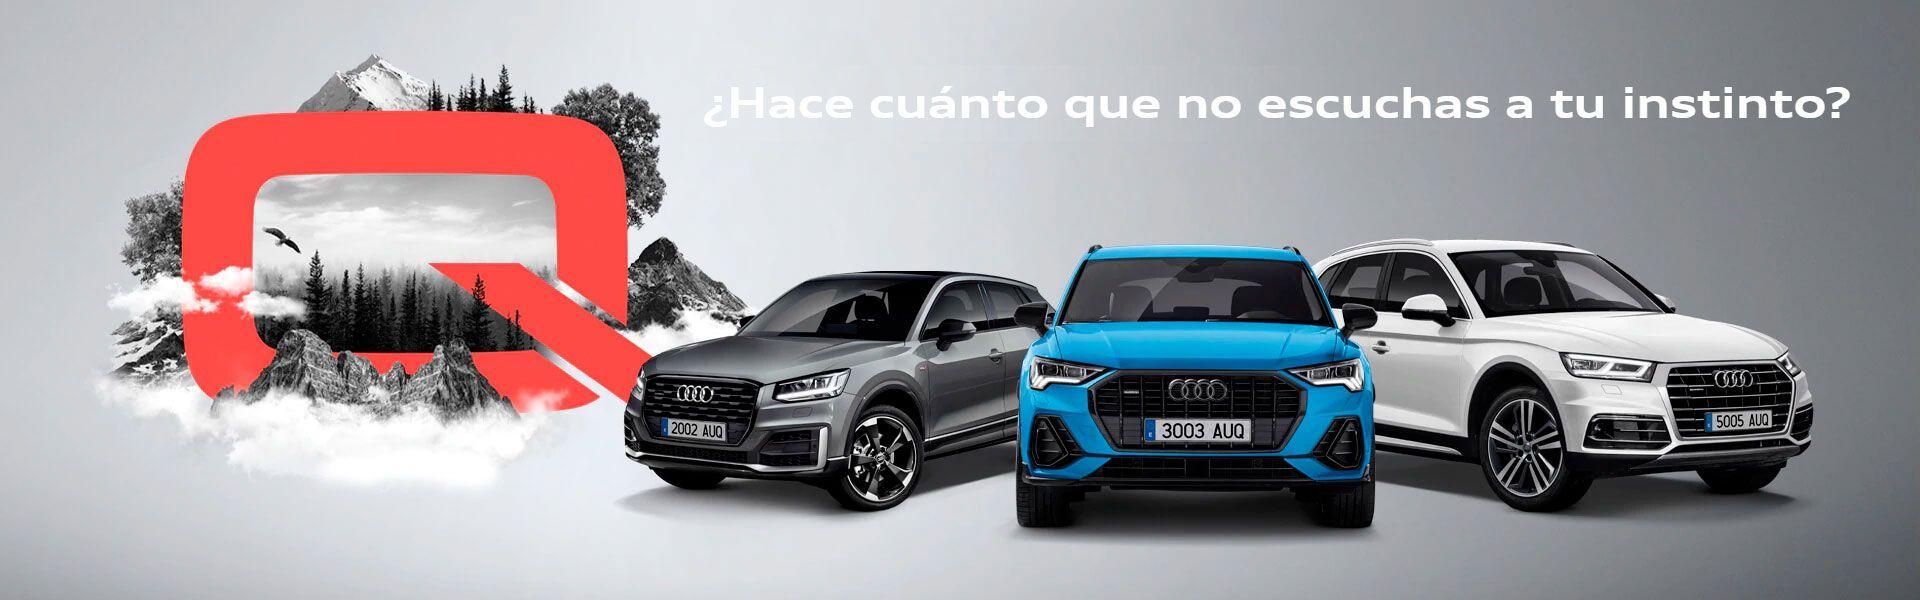 Renting en toda la gama Q de Audi